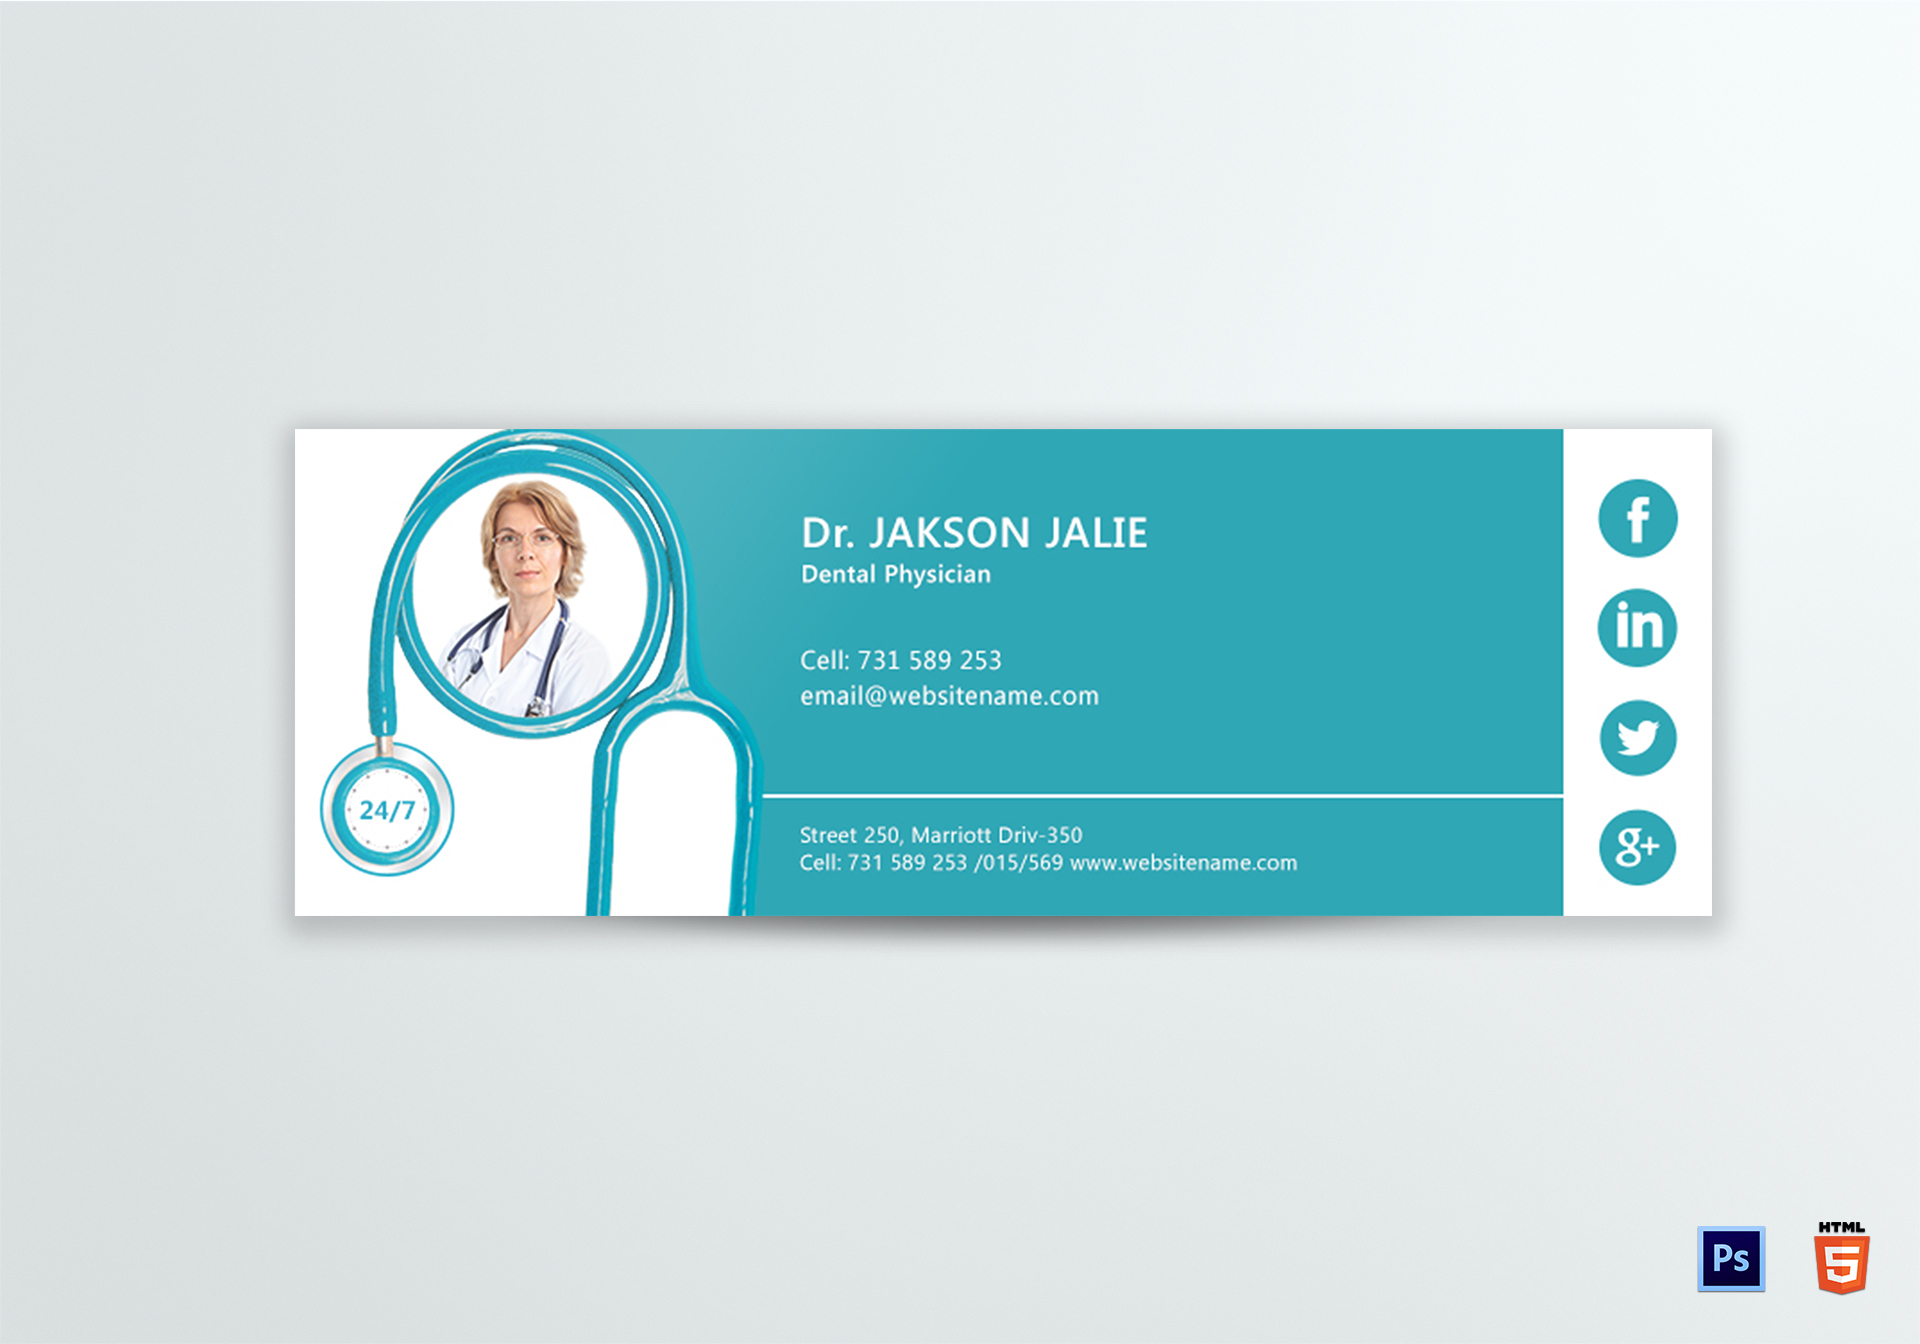 Dental Care Email Signature